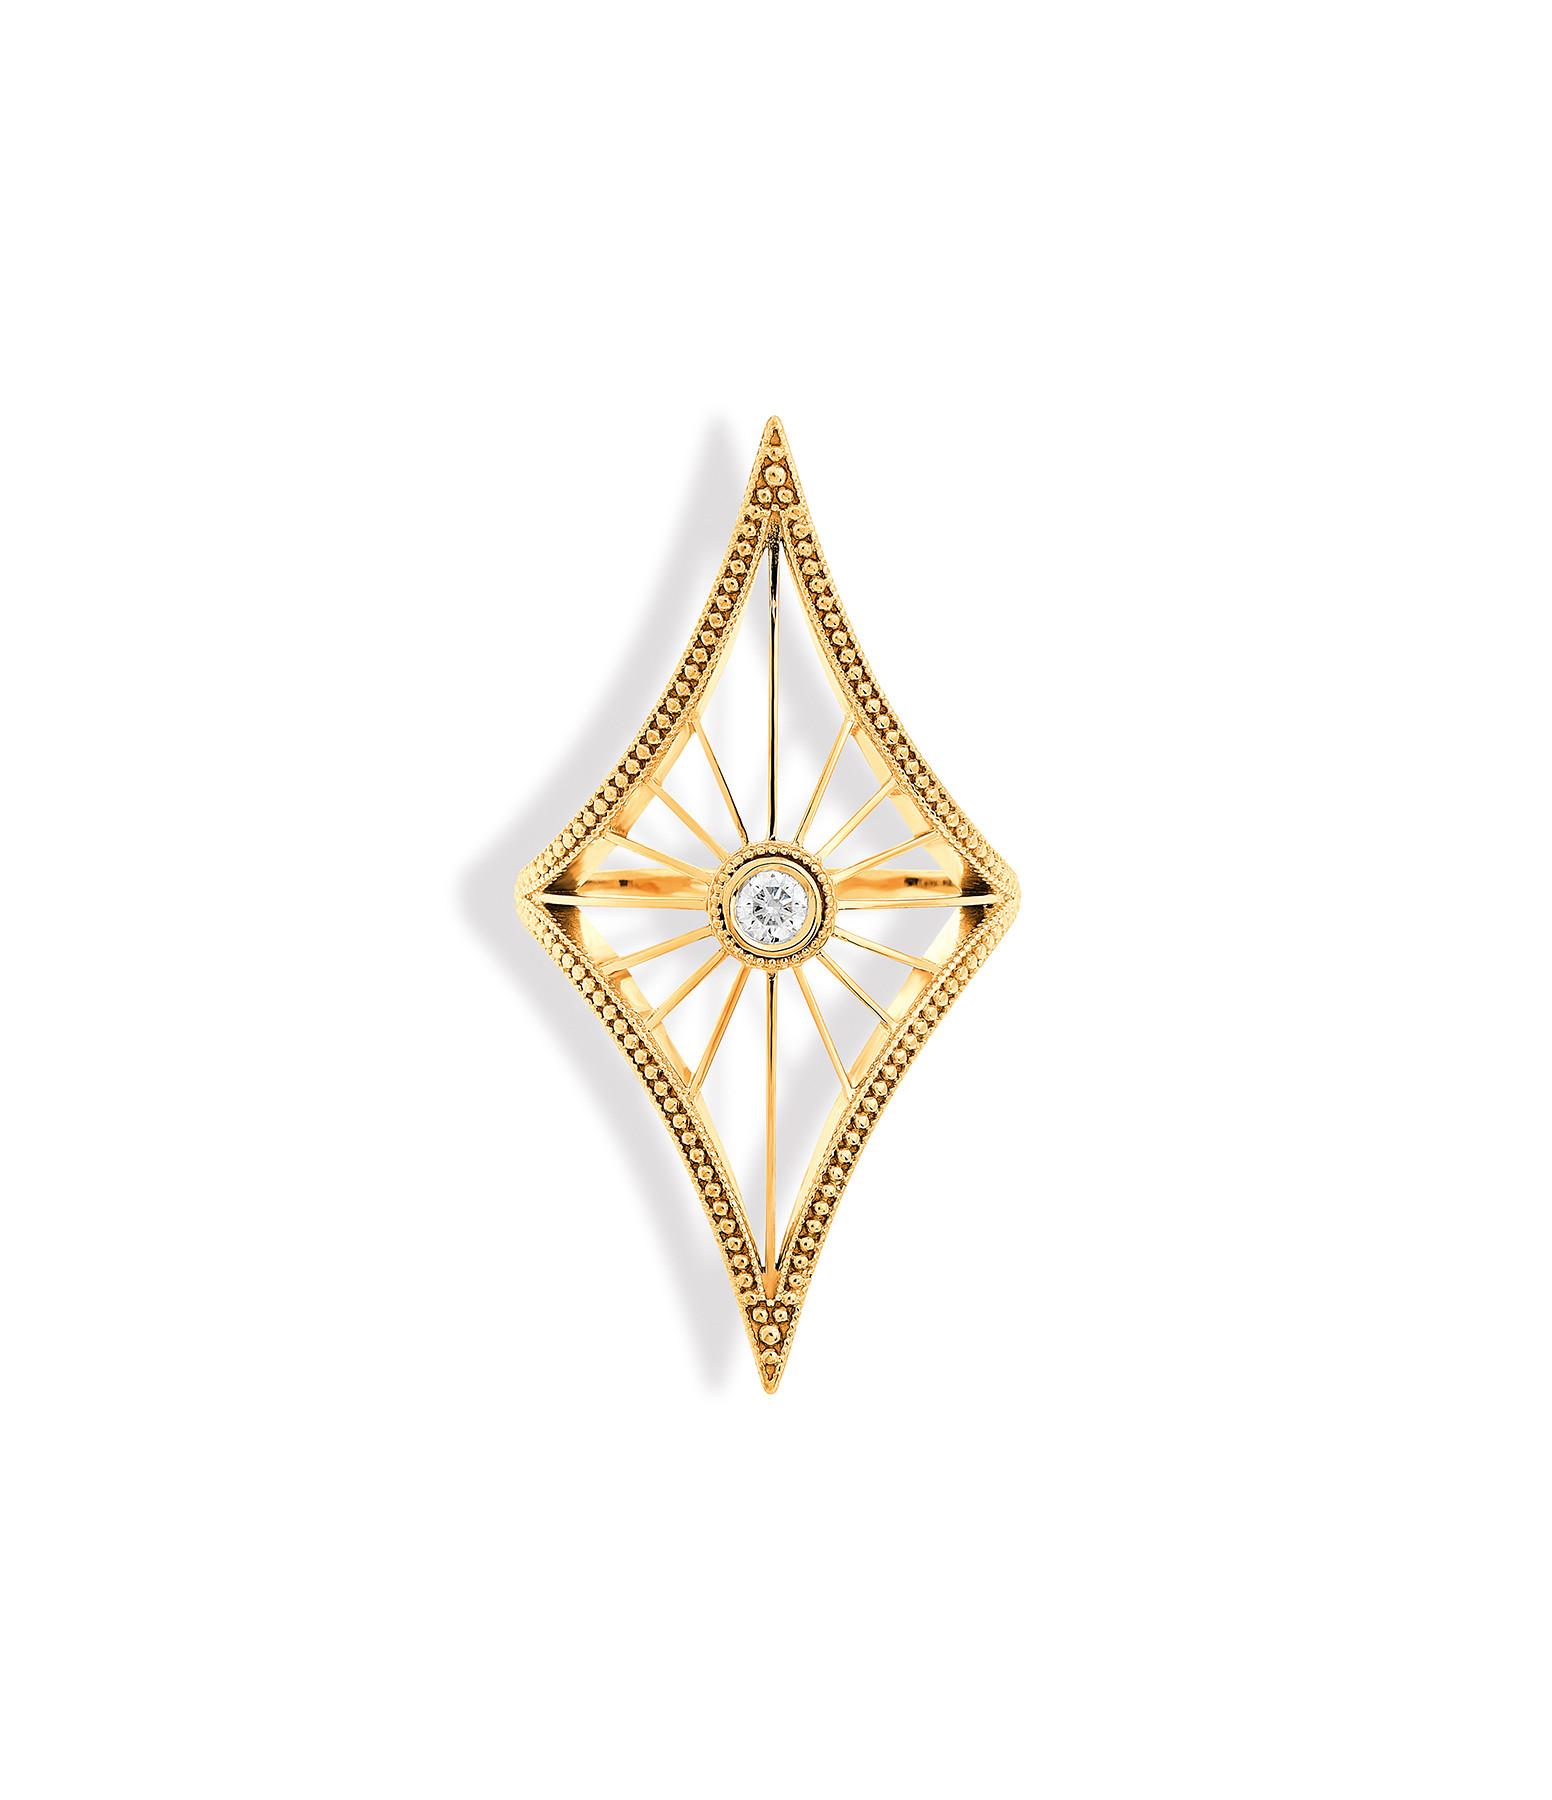 NAVA JOAILLERIE - Bague Cheyenne Losange Diamants Or Jaune